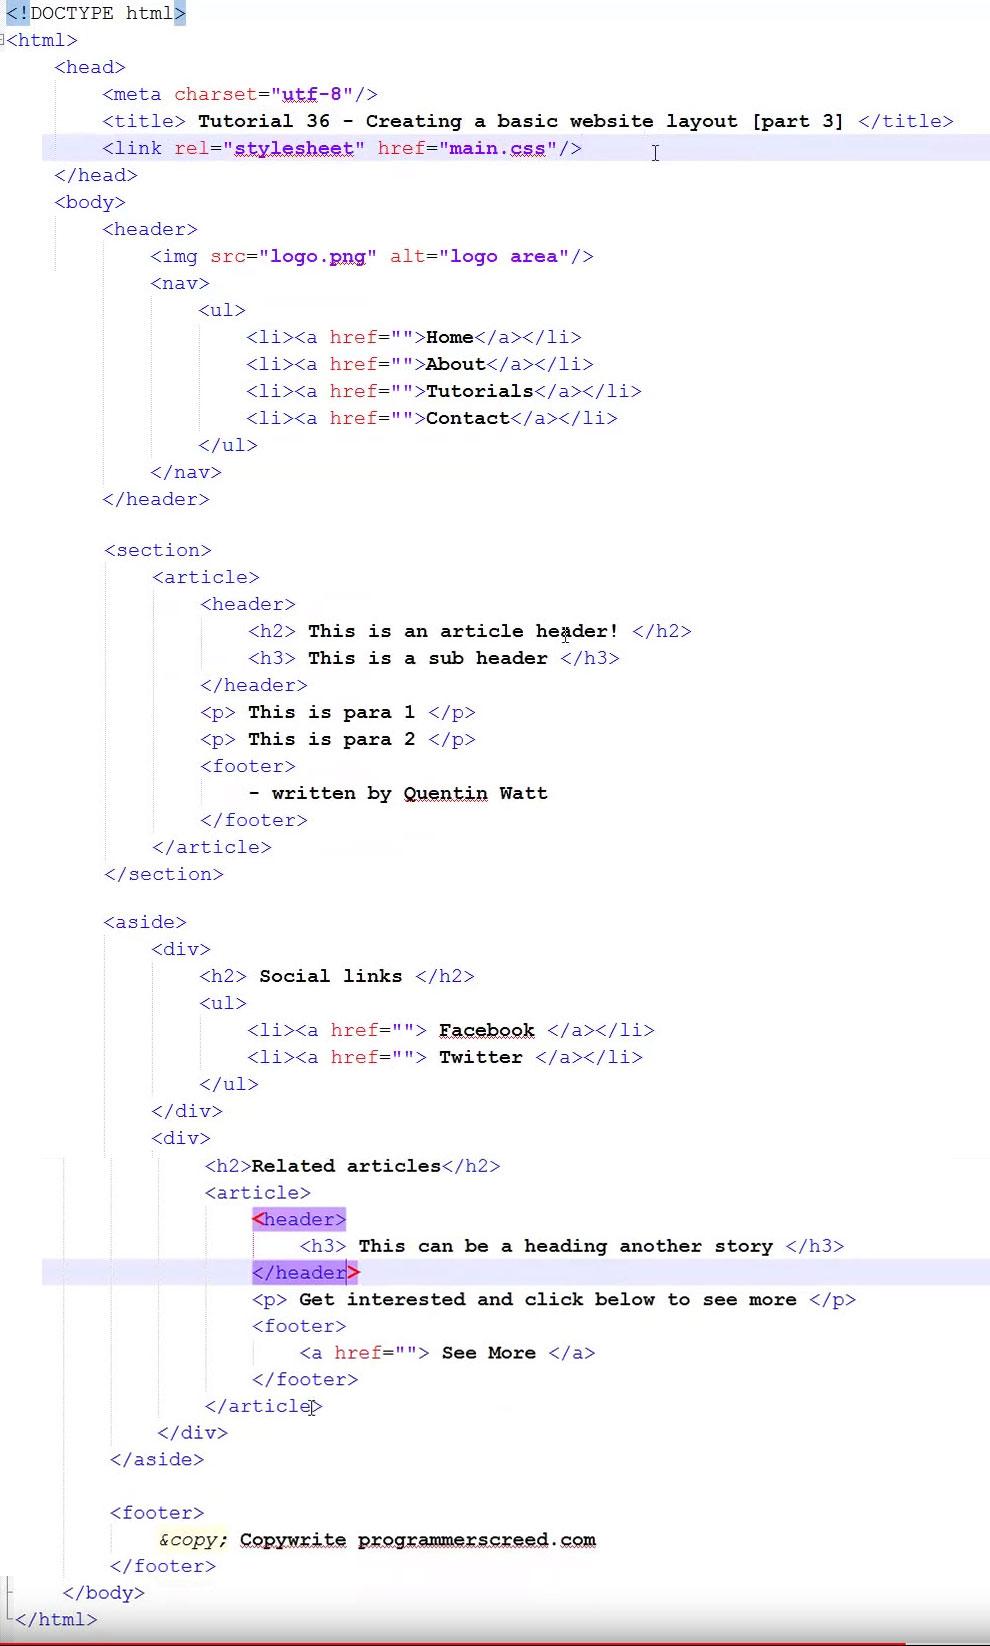 layout-code-html5-chuan-seo.jpg